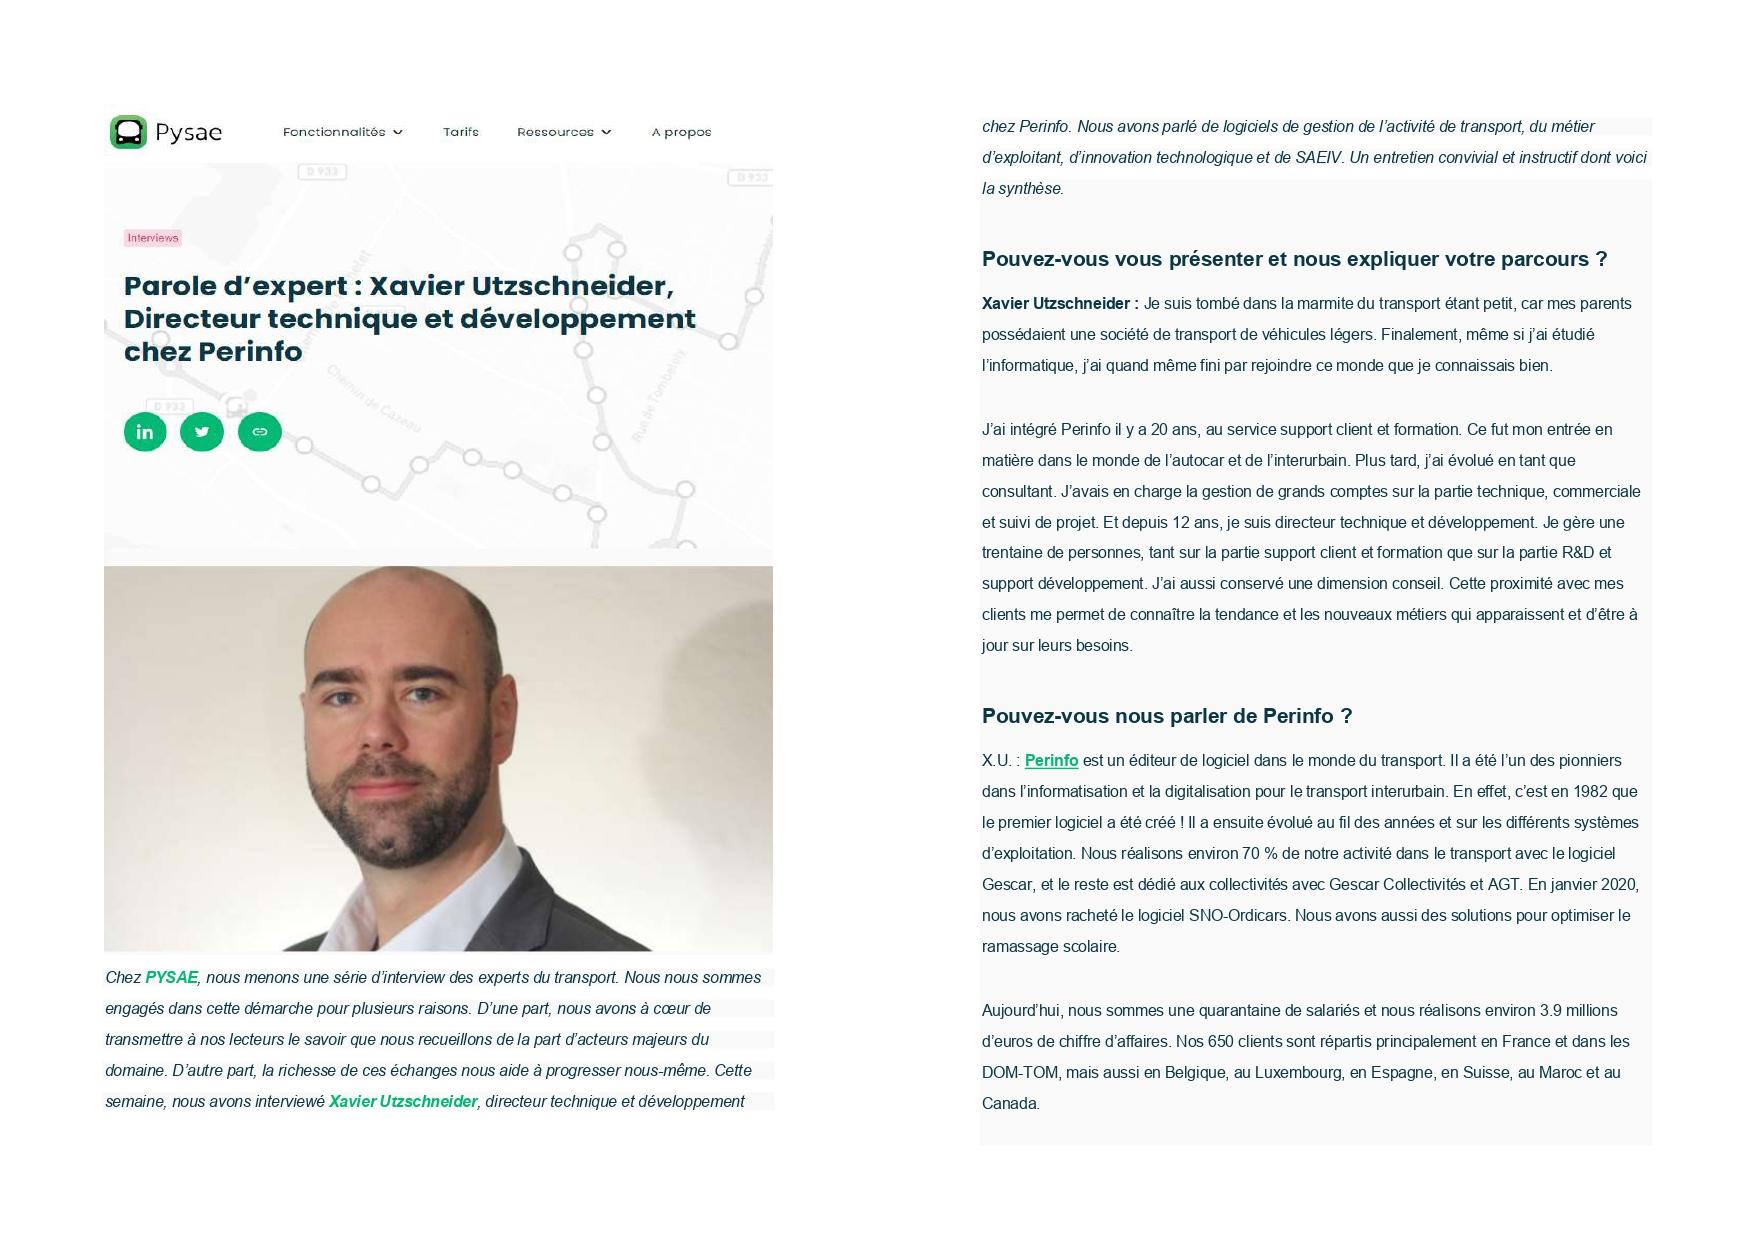 Interview de Xavier Utzschneider, directeur technique et développement